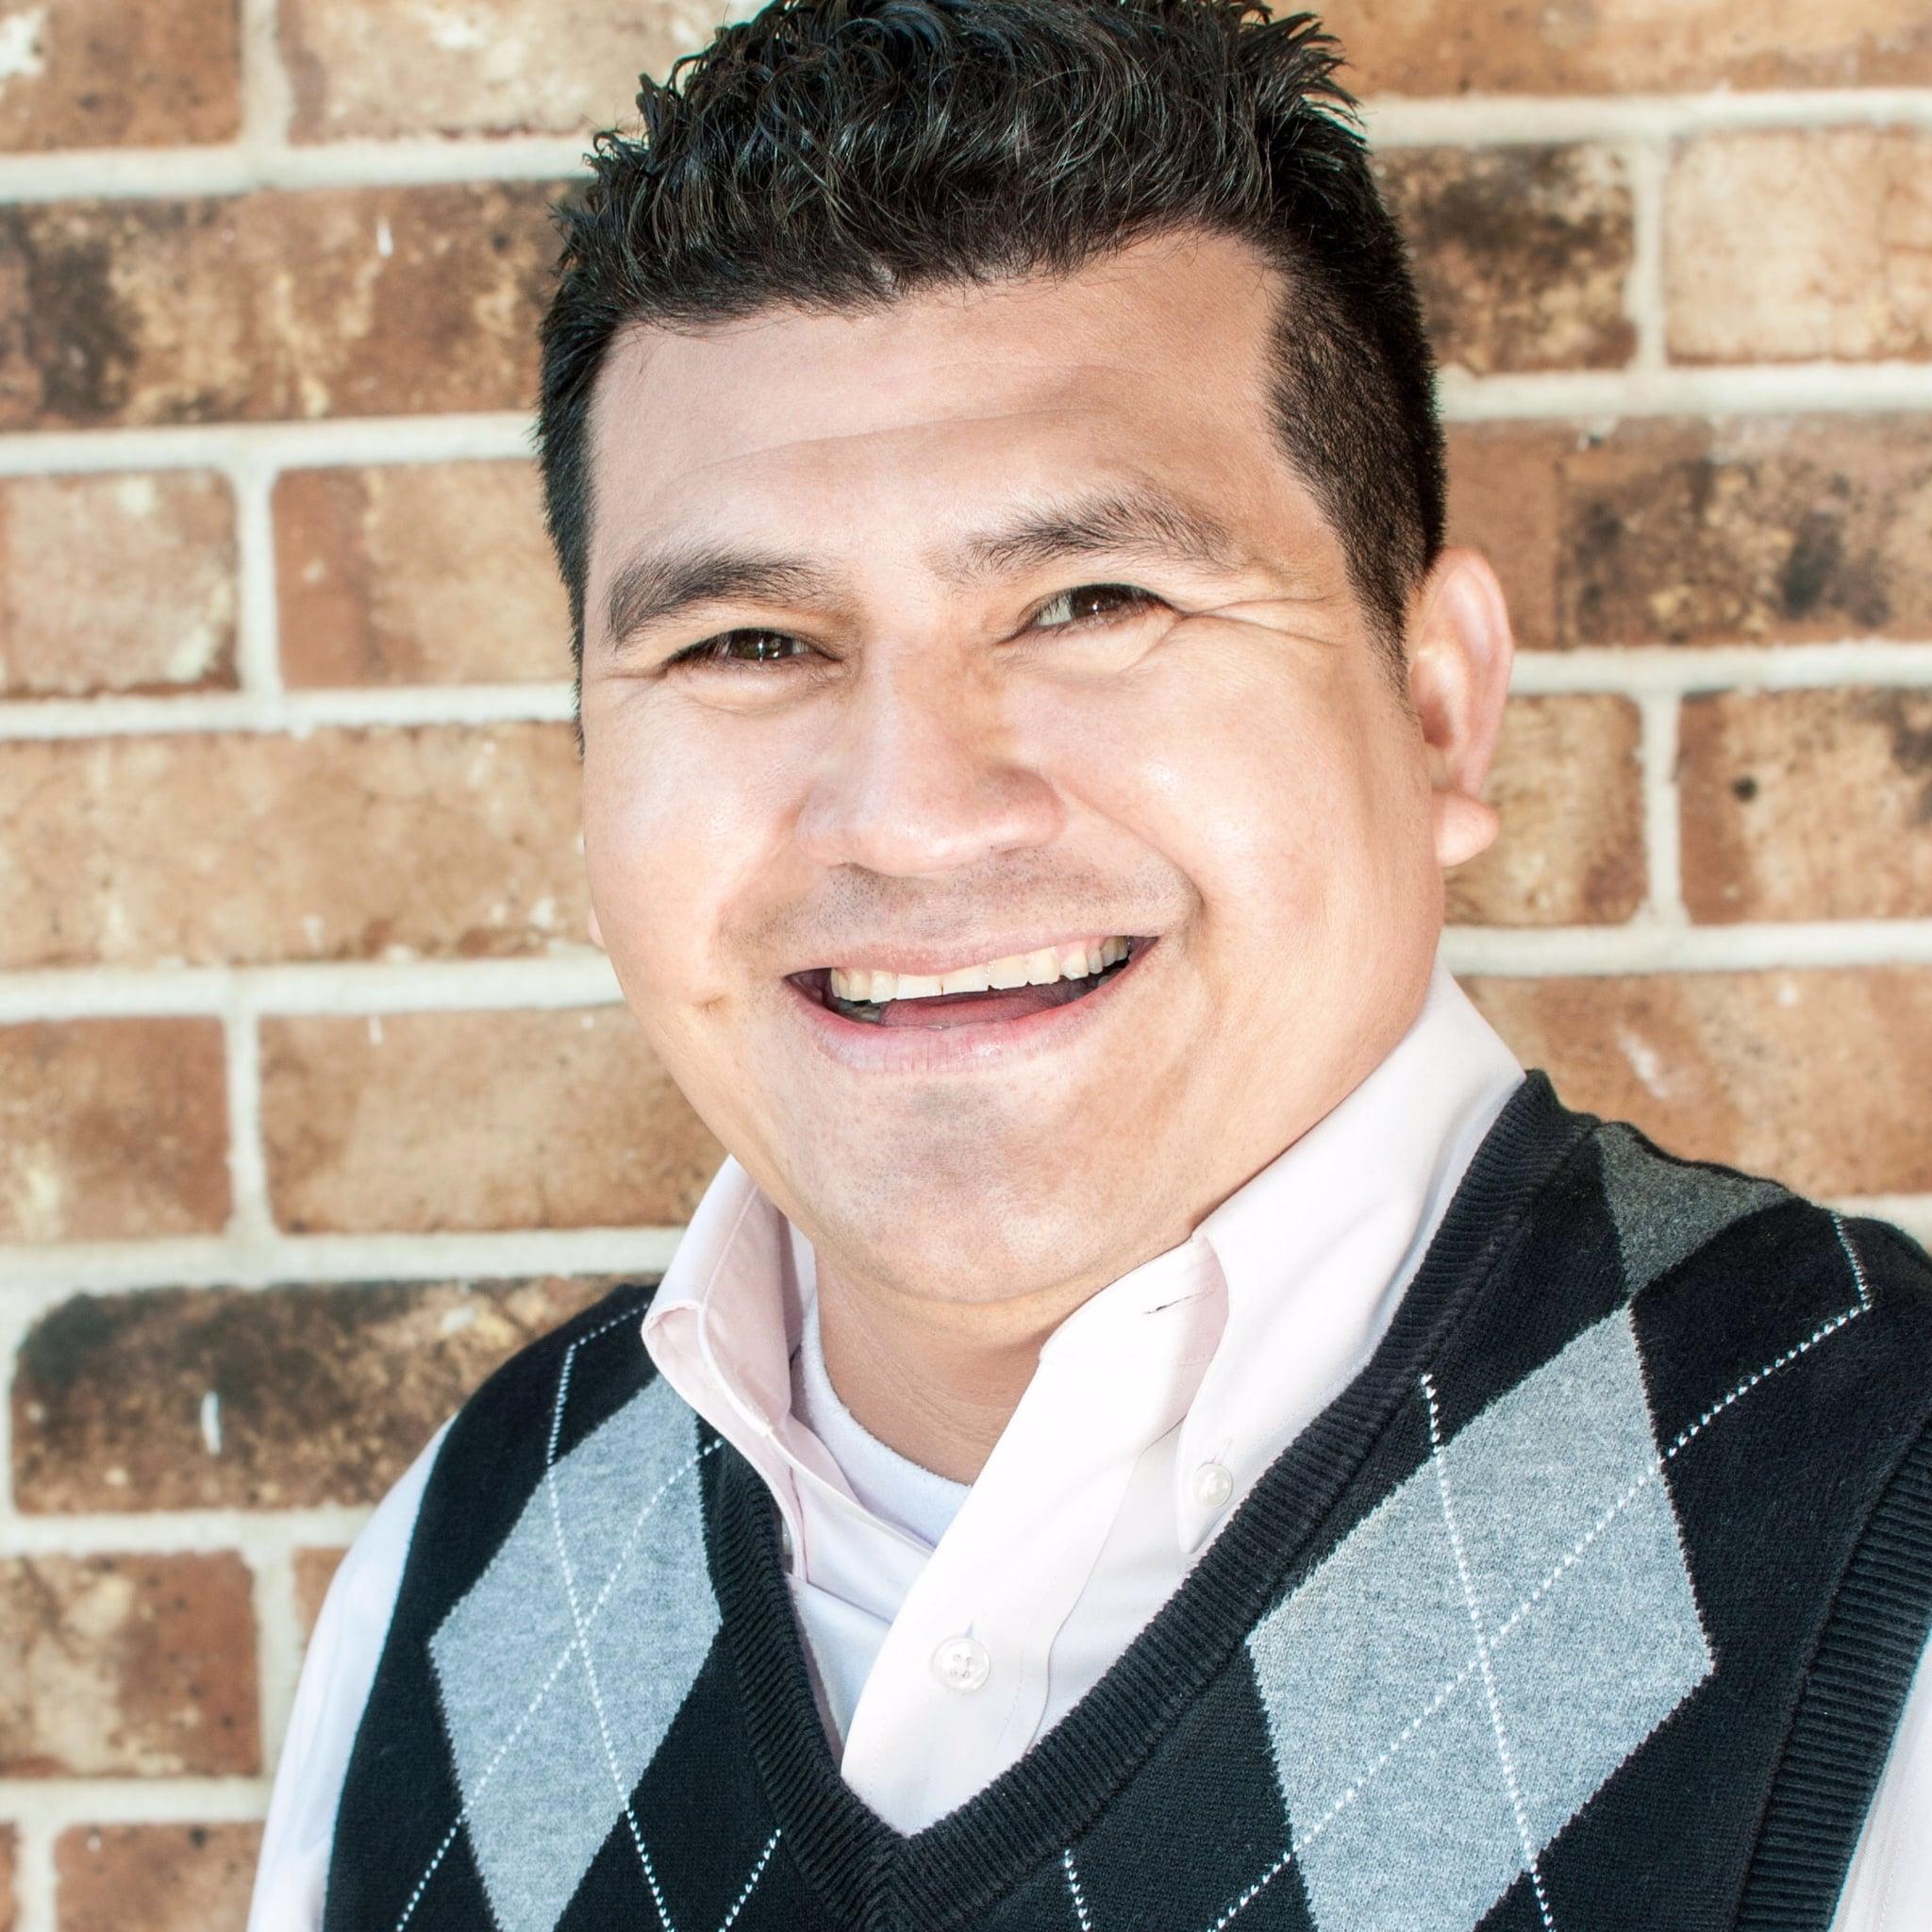 Miguel Ortiz lider de ujieres en la familia de Jesus iglesia evangelica houston tx